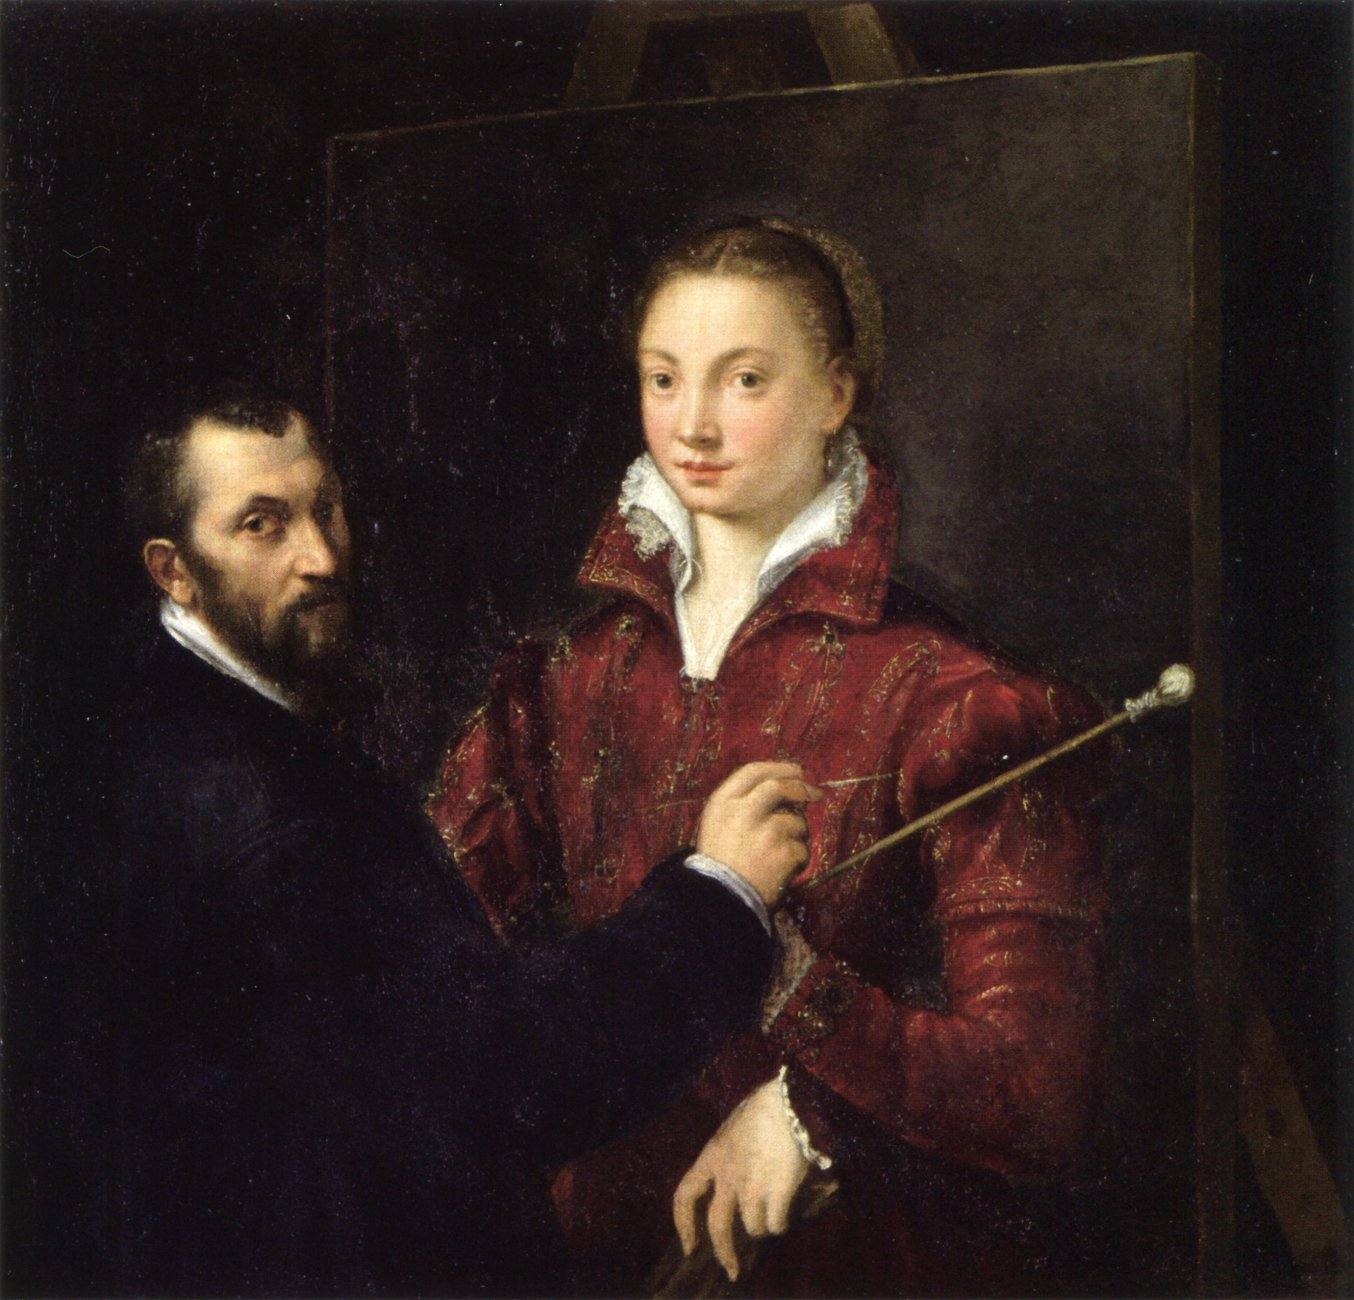 Self-portrait_with_Bernardino_Campi_by_Sofonisba_Anguissola.jpg